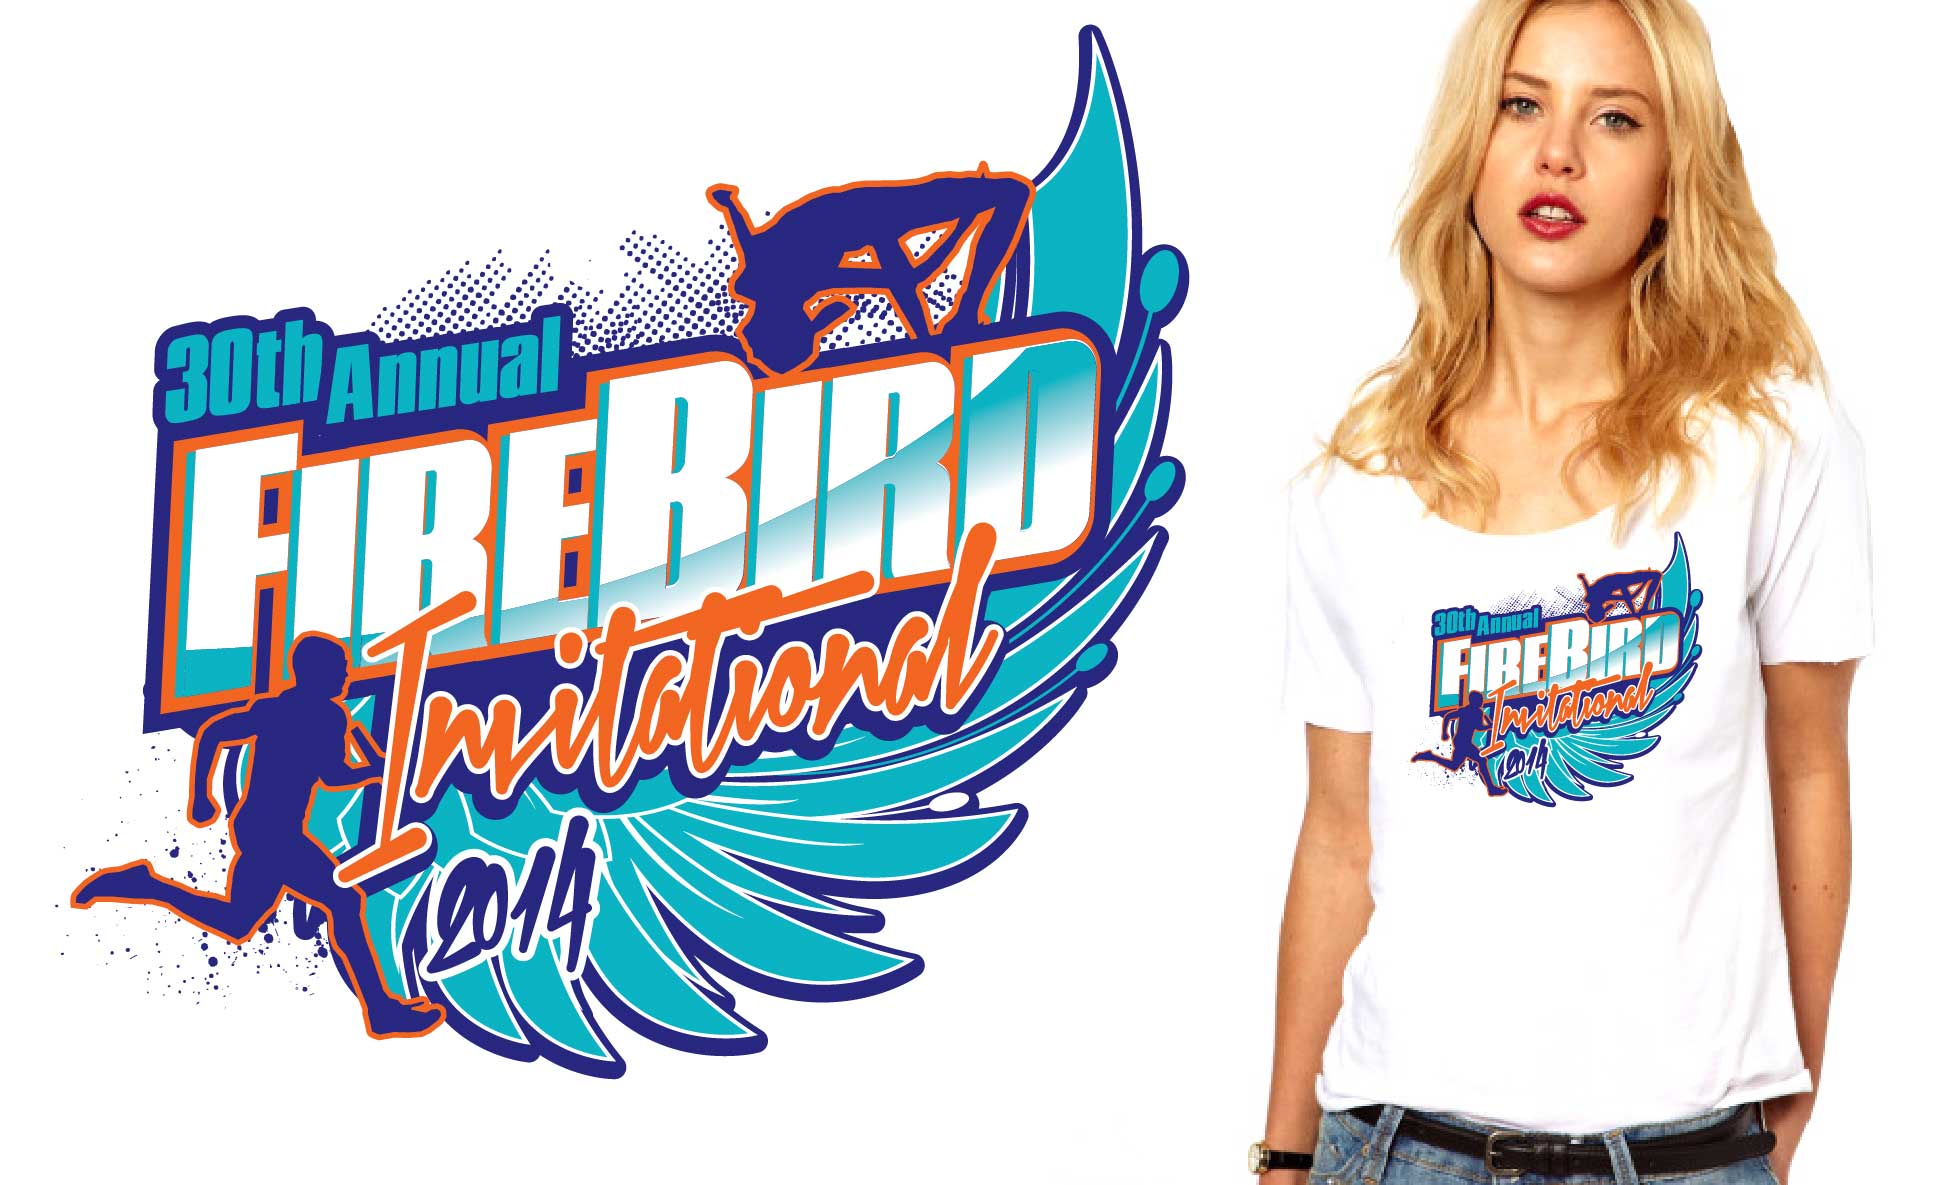 2014 30th Annual Fire Bird Invitational cross country tshirt design